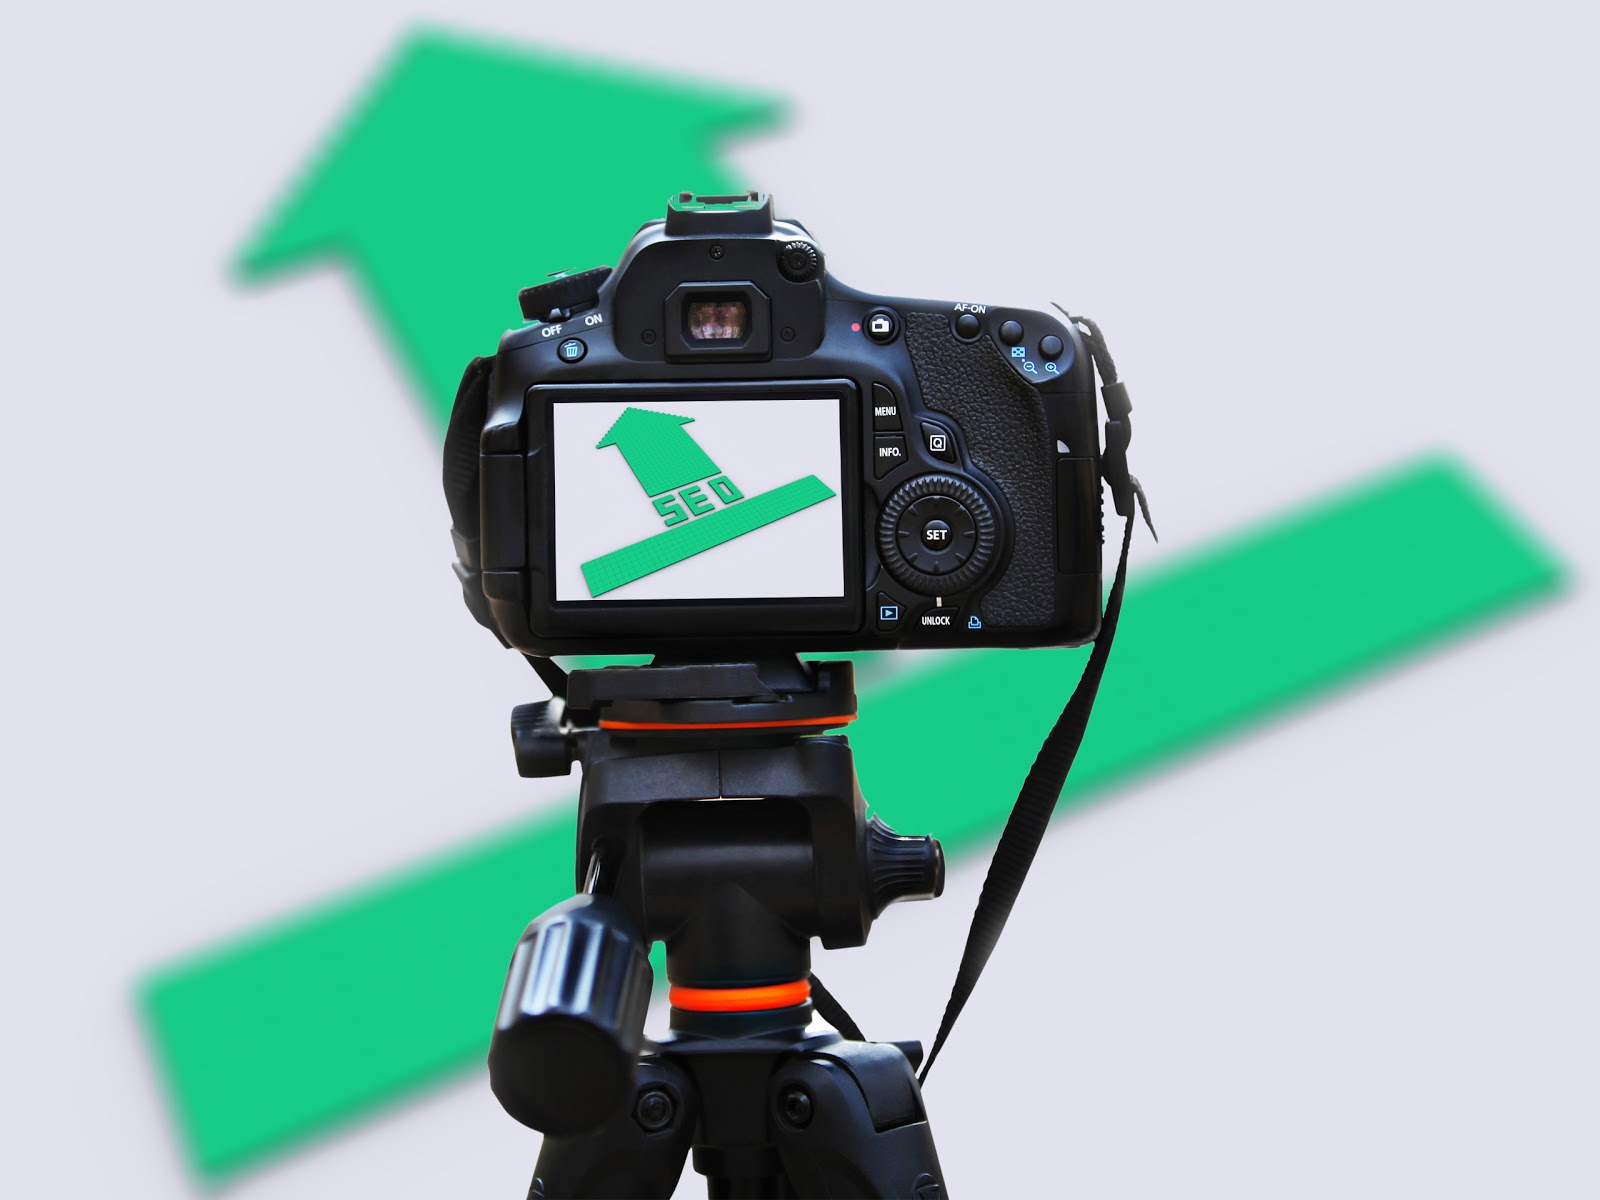 video camera taping a green arrow